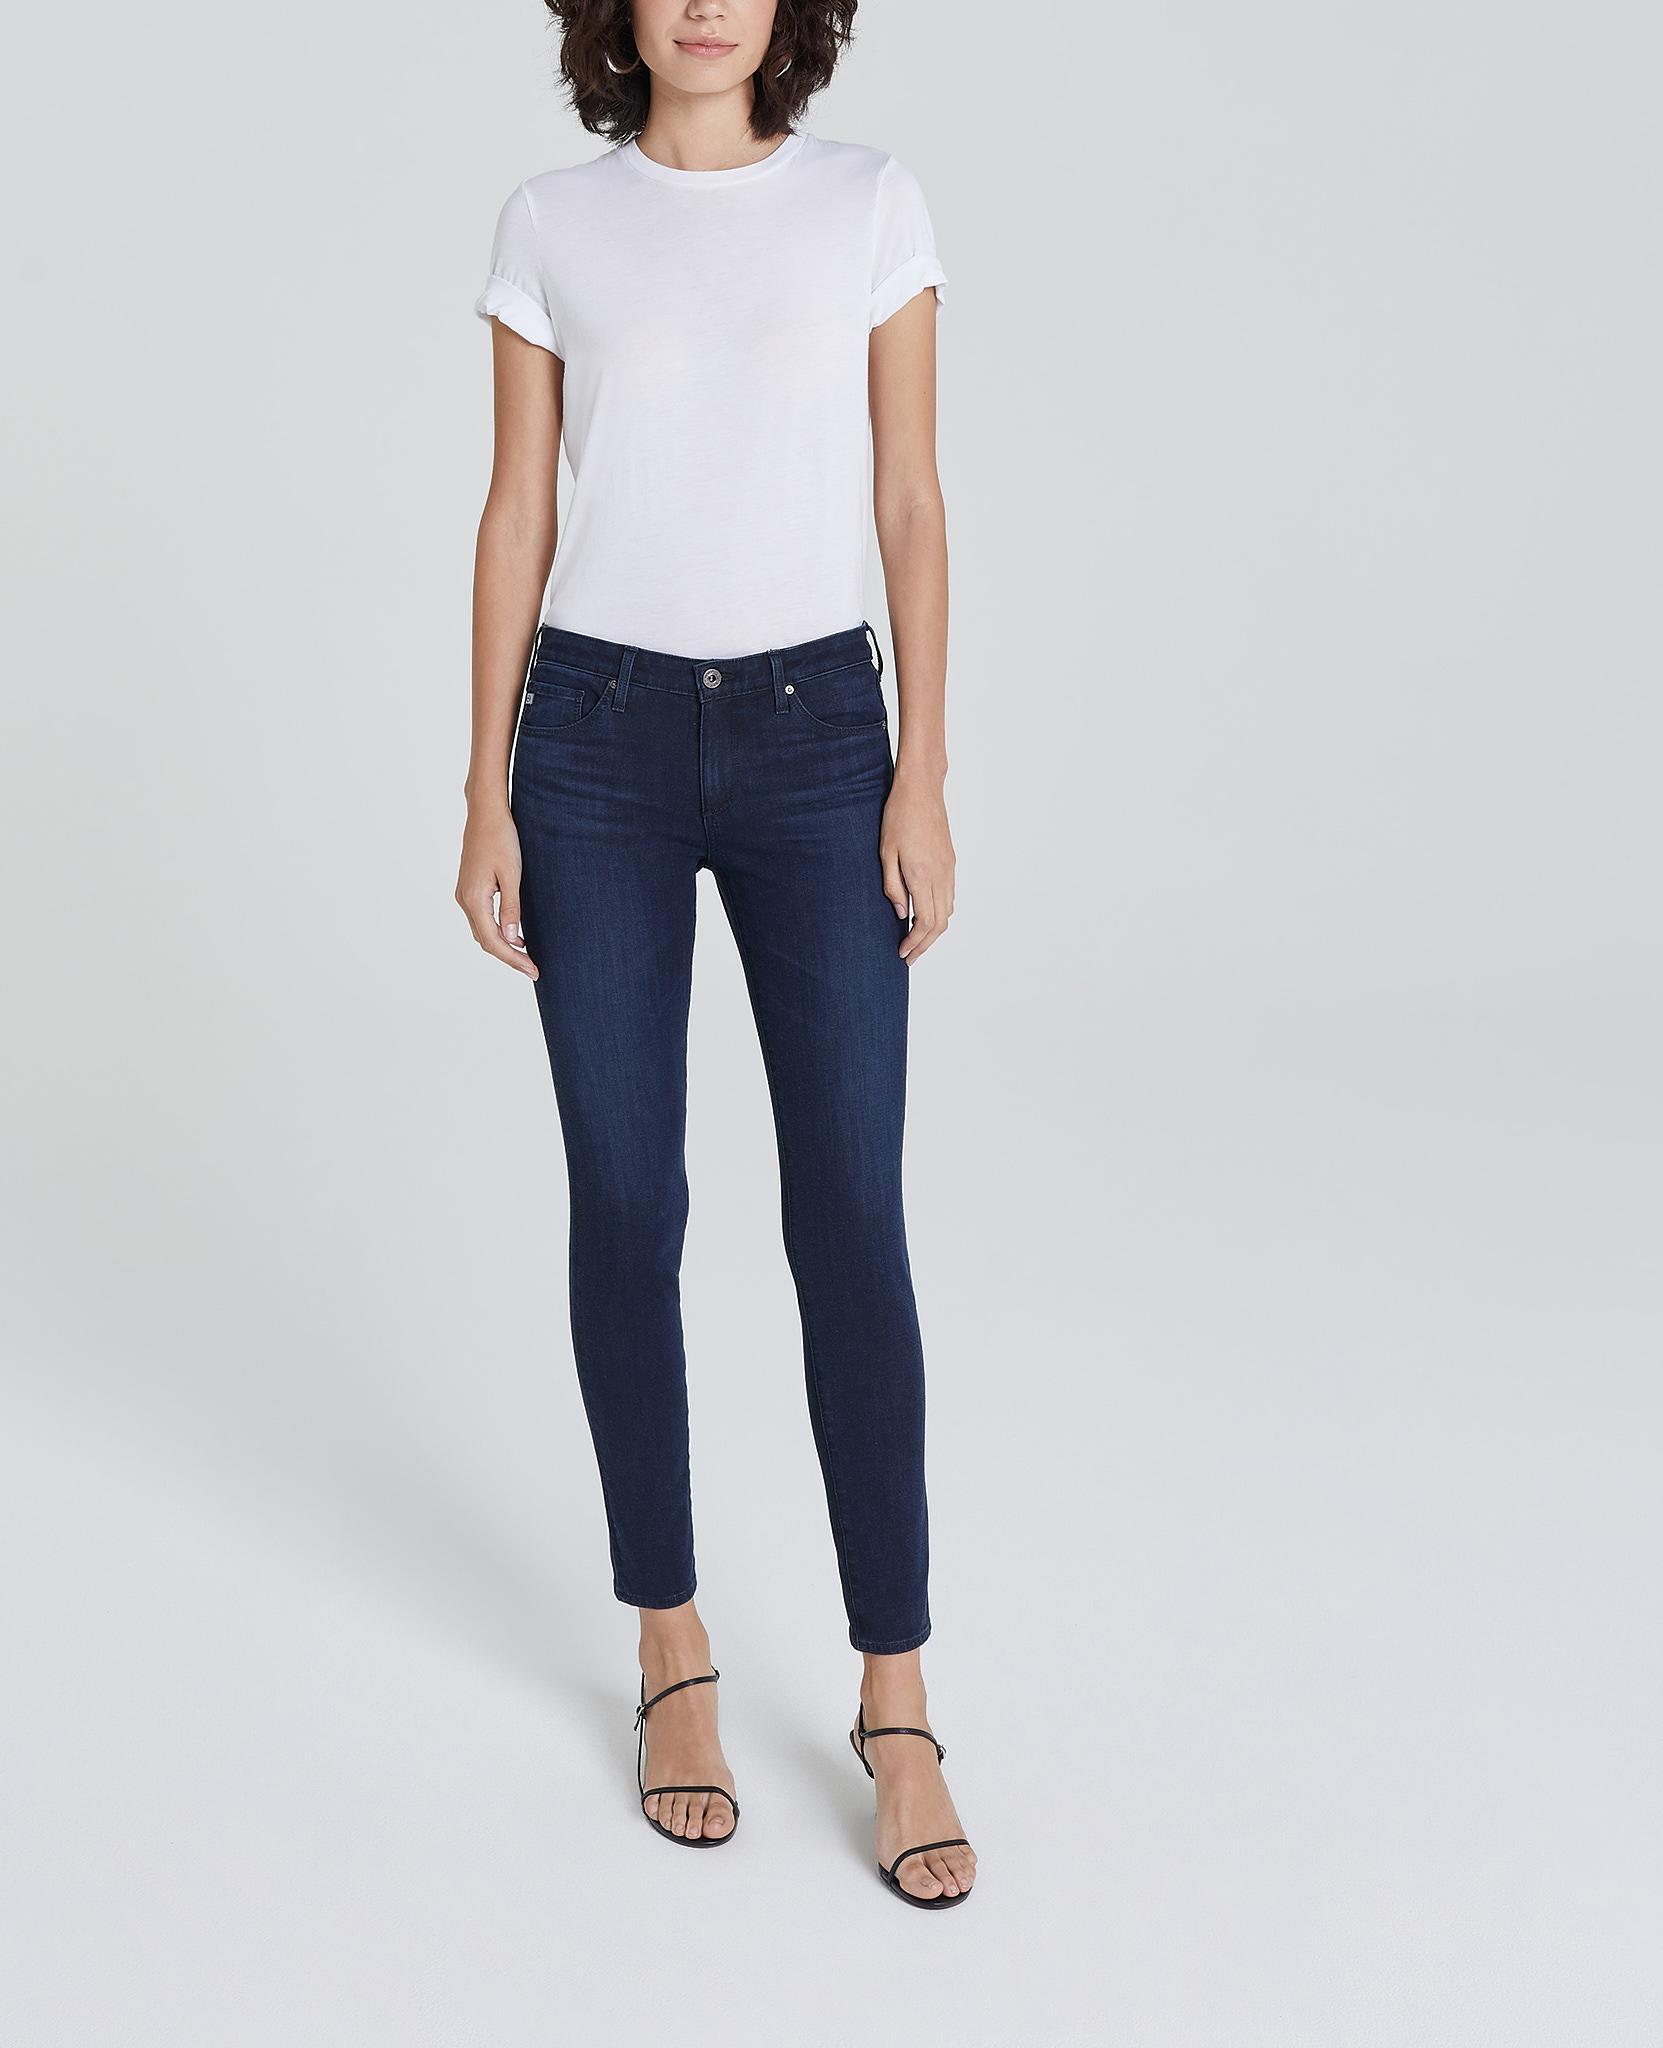 AG Adriano Goldschmied Womens Farrah Skinny Ankle Jean